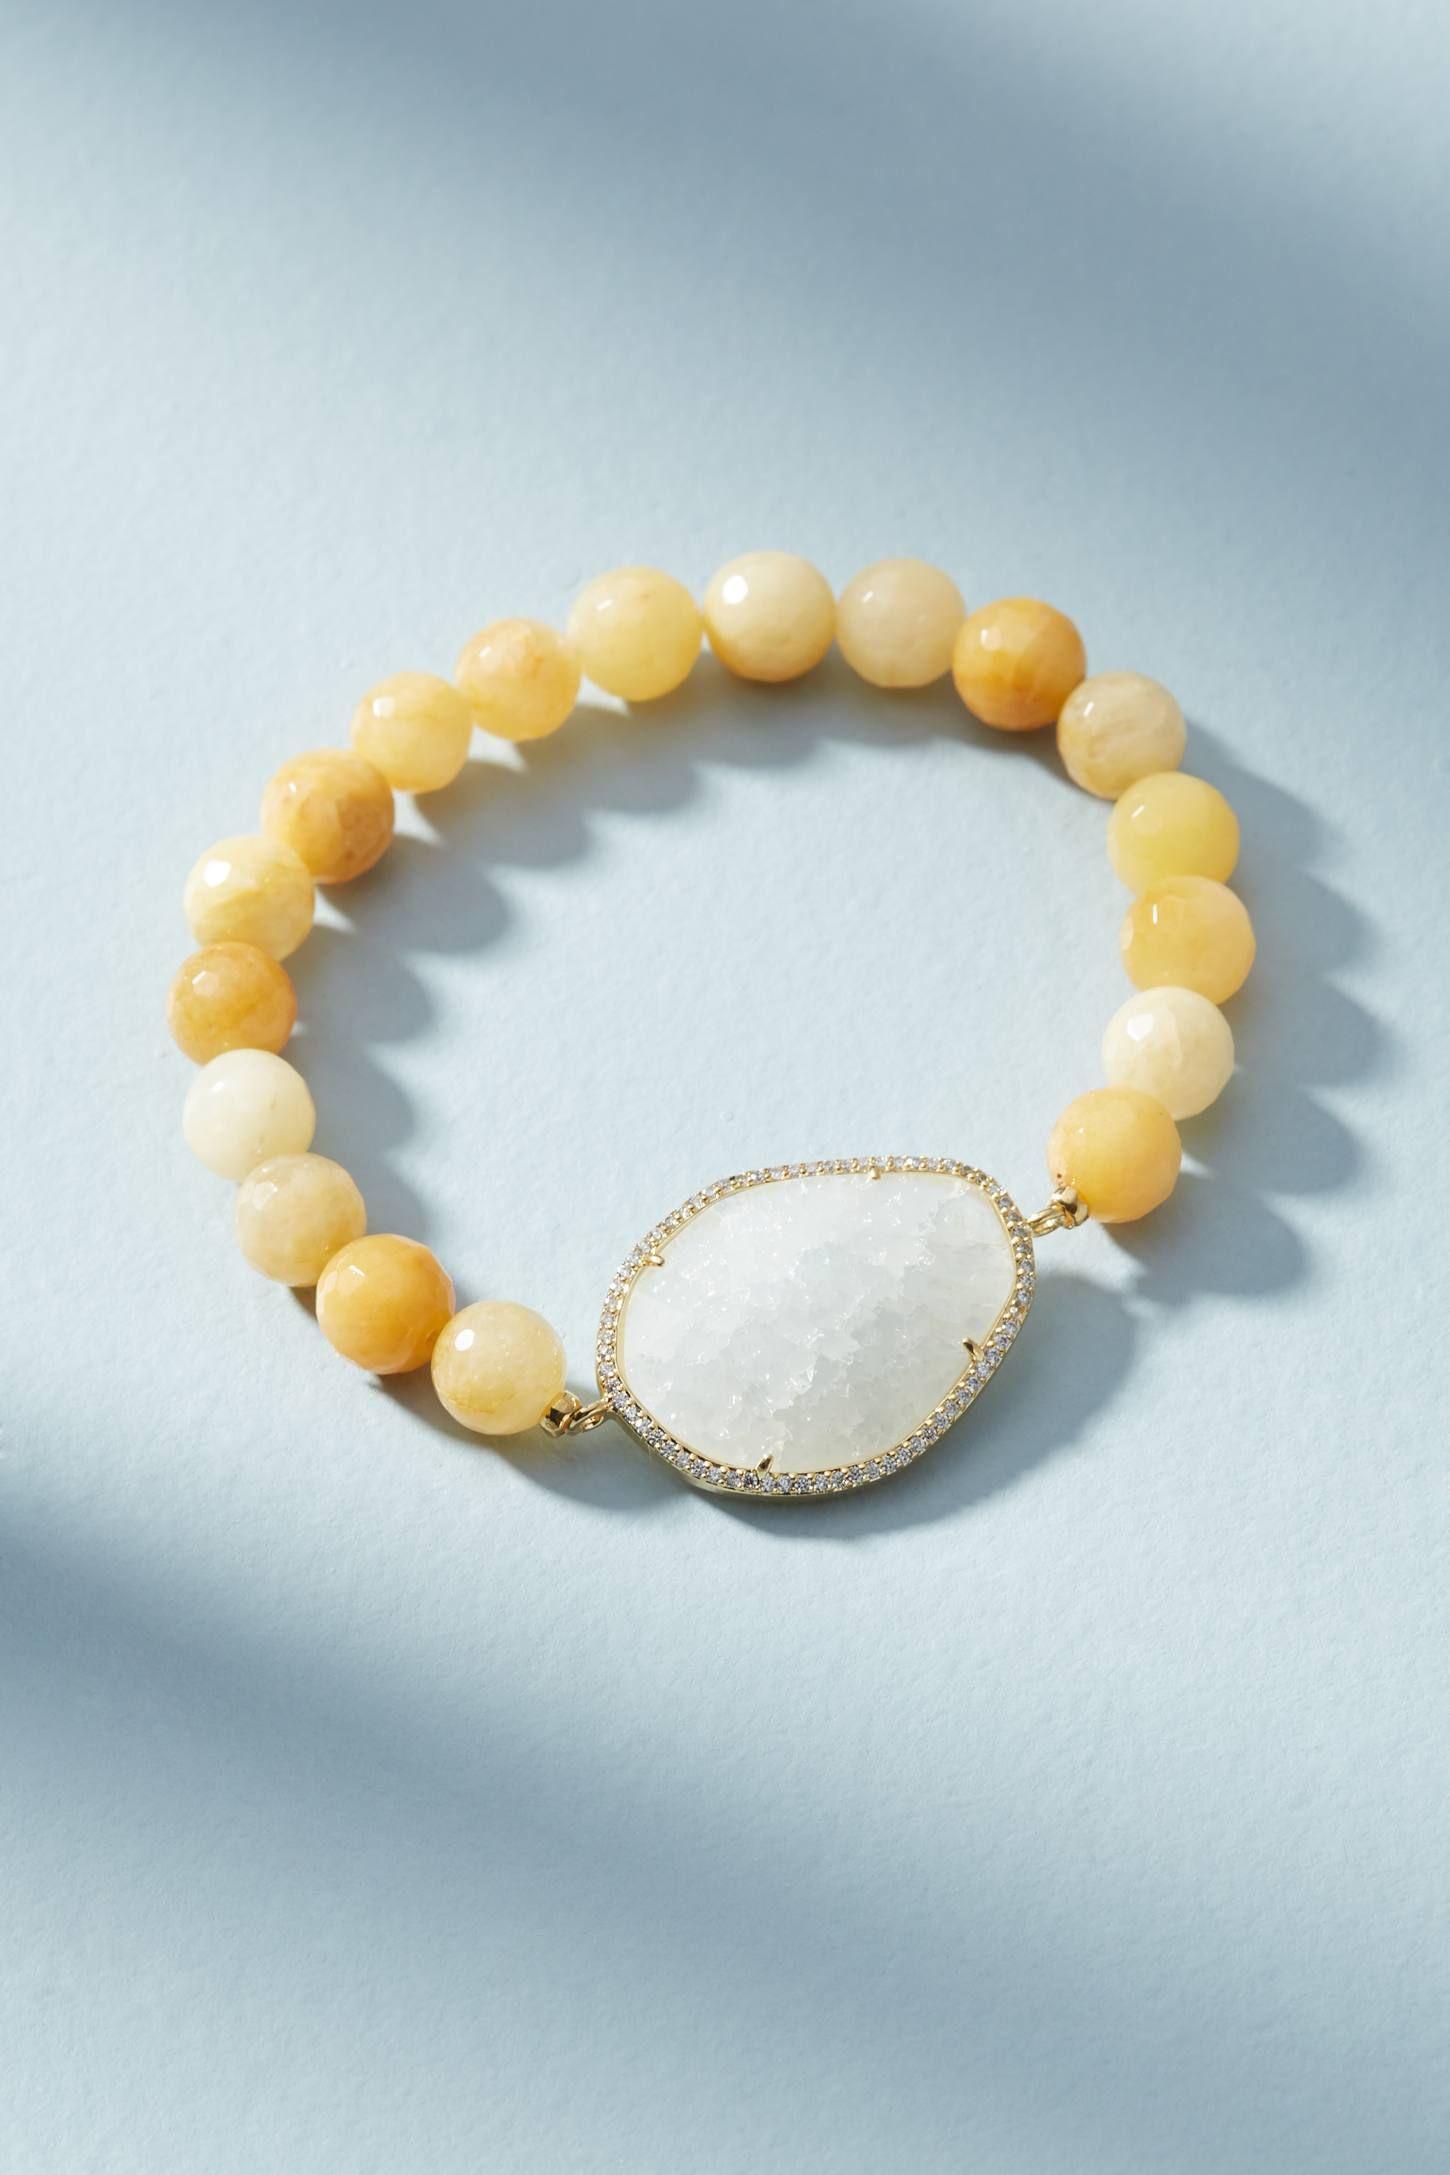 Anthropologie Coloma Stone Bracelet iFujuhAo